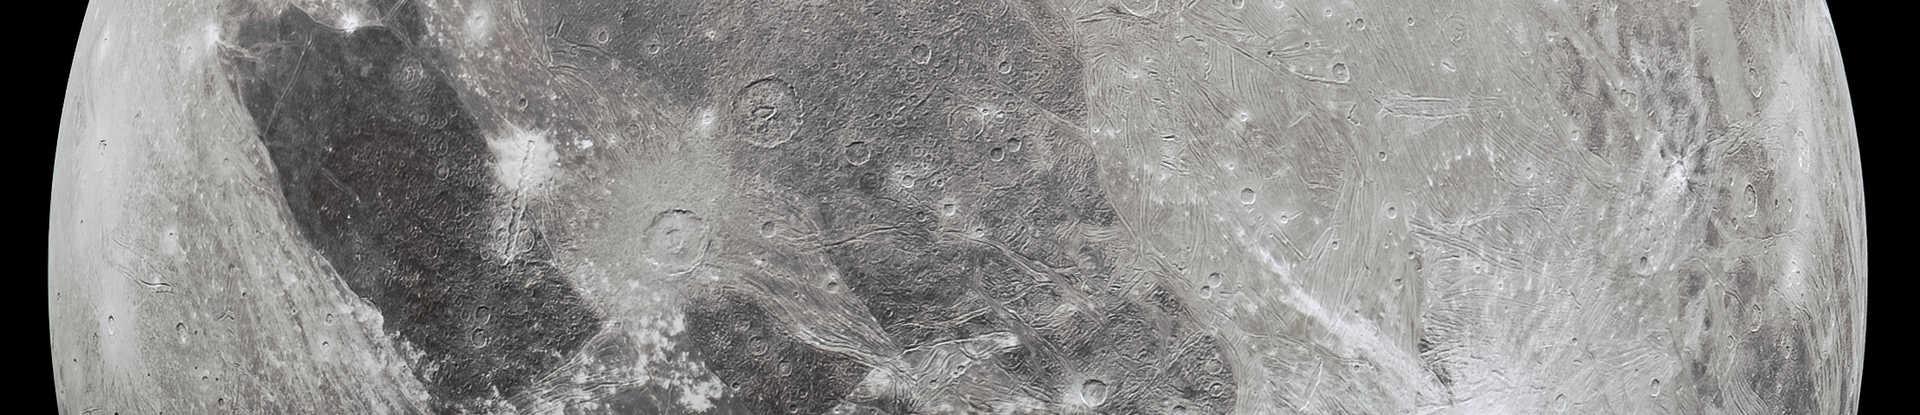 Press Release-SwRI scientists help identify water vapor in atmosphere of icy Jupiter moon